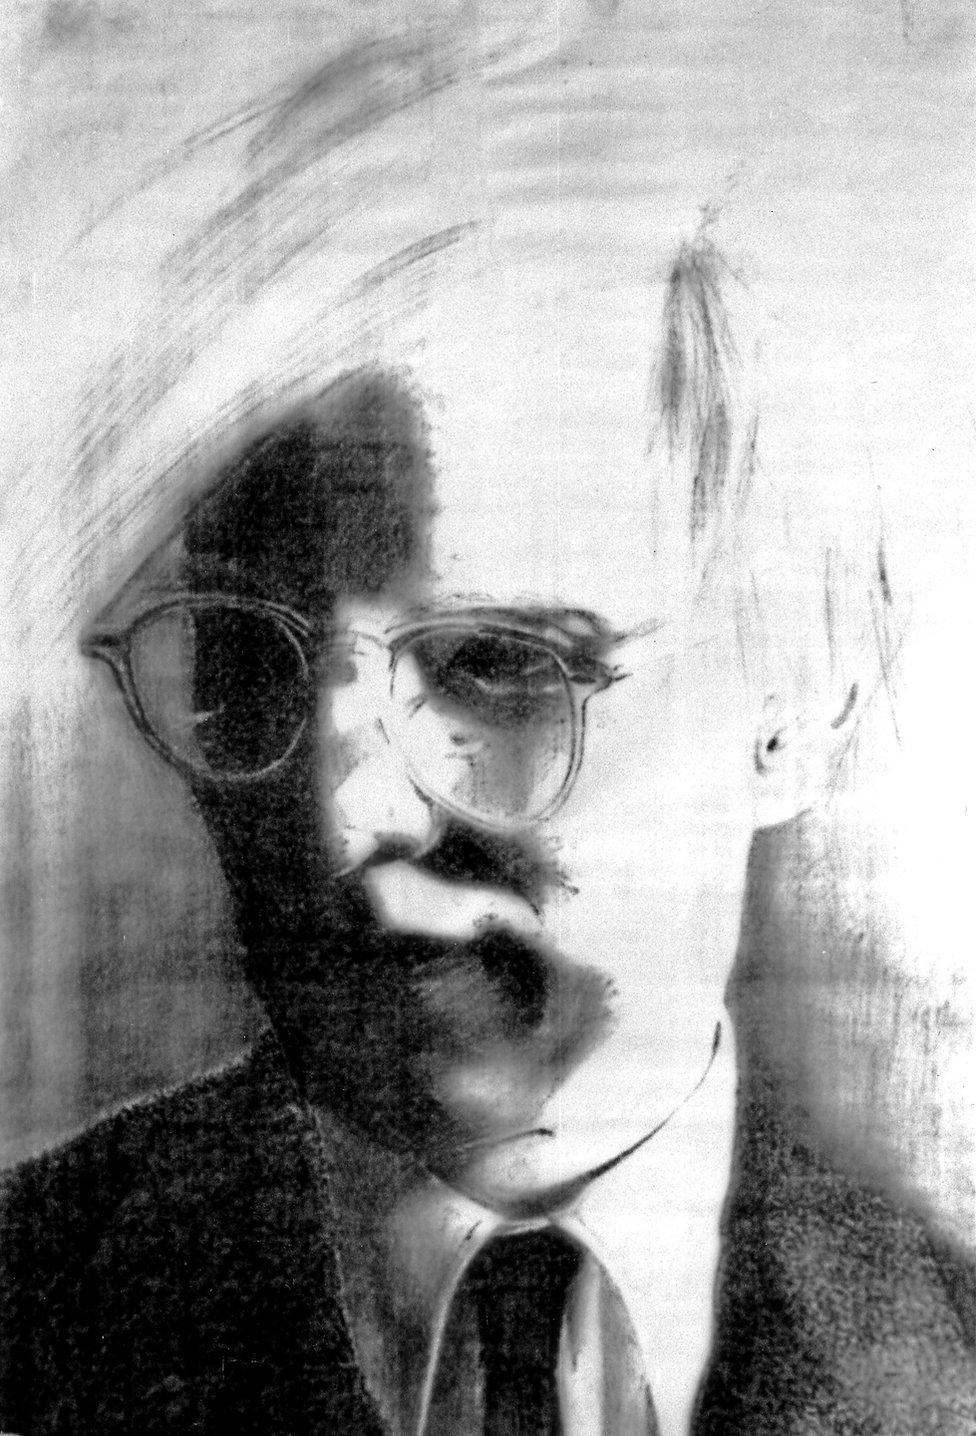 Christiaan Tonnis - Andy Warhol